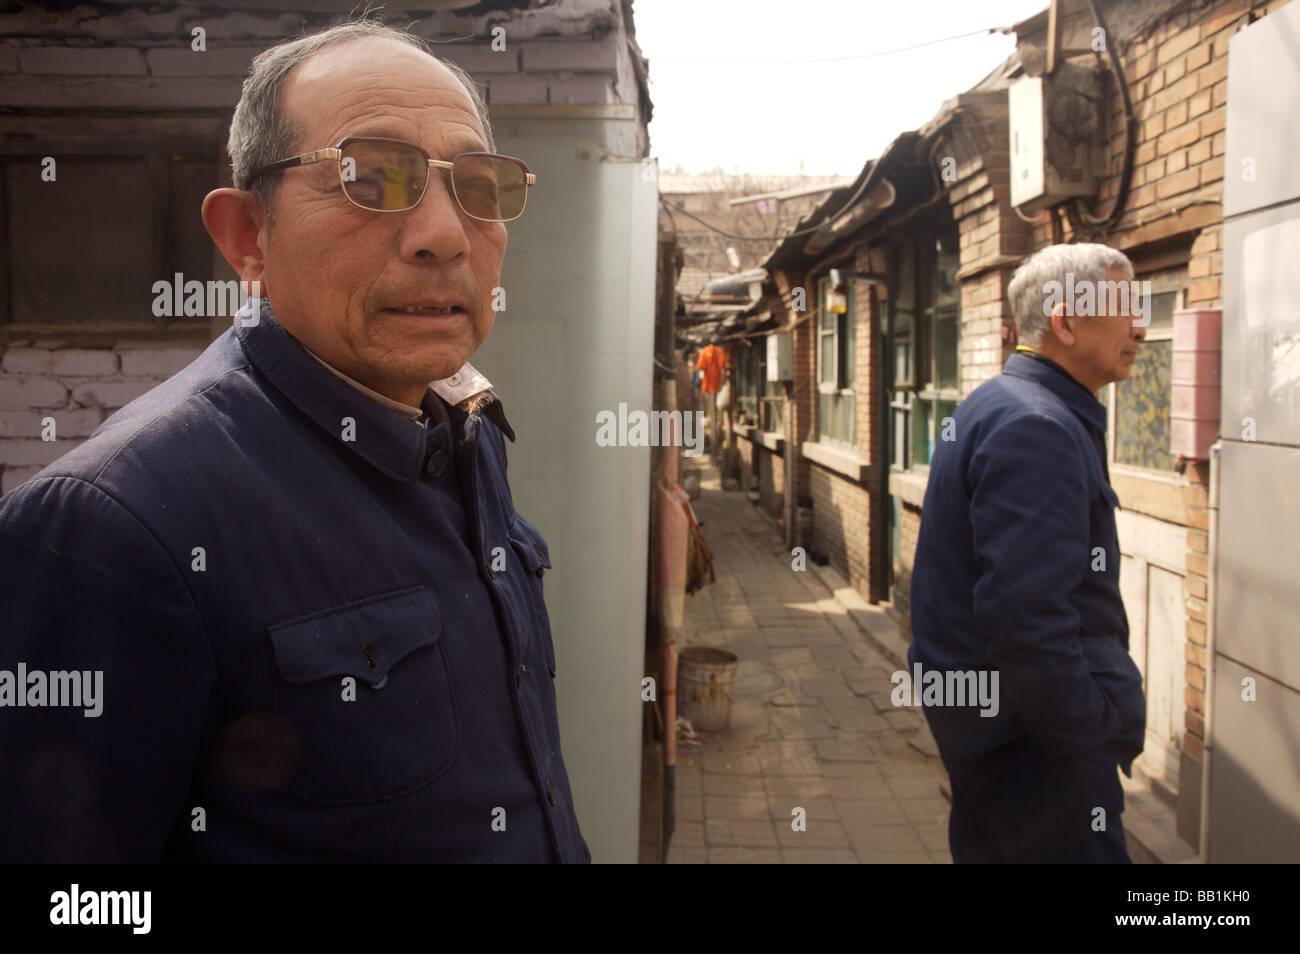 Old men in communist uniform in Hutong Beijing China - Stock Image